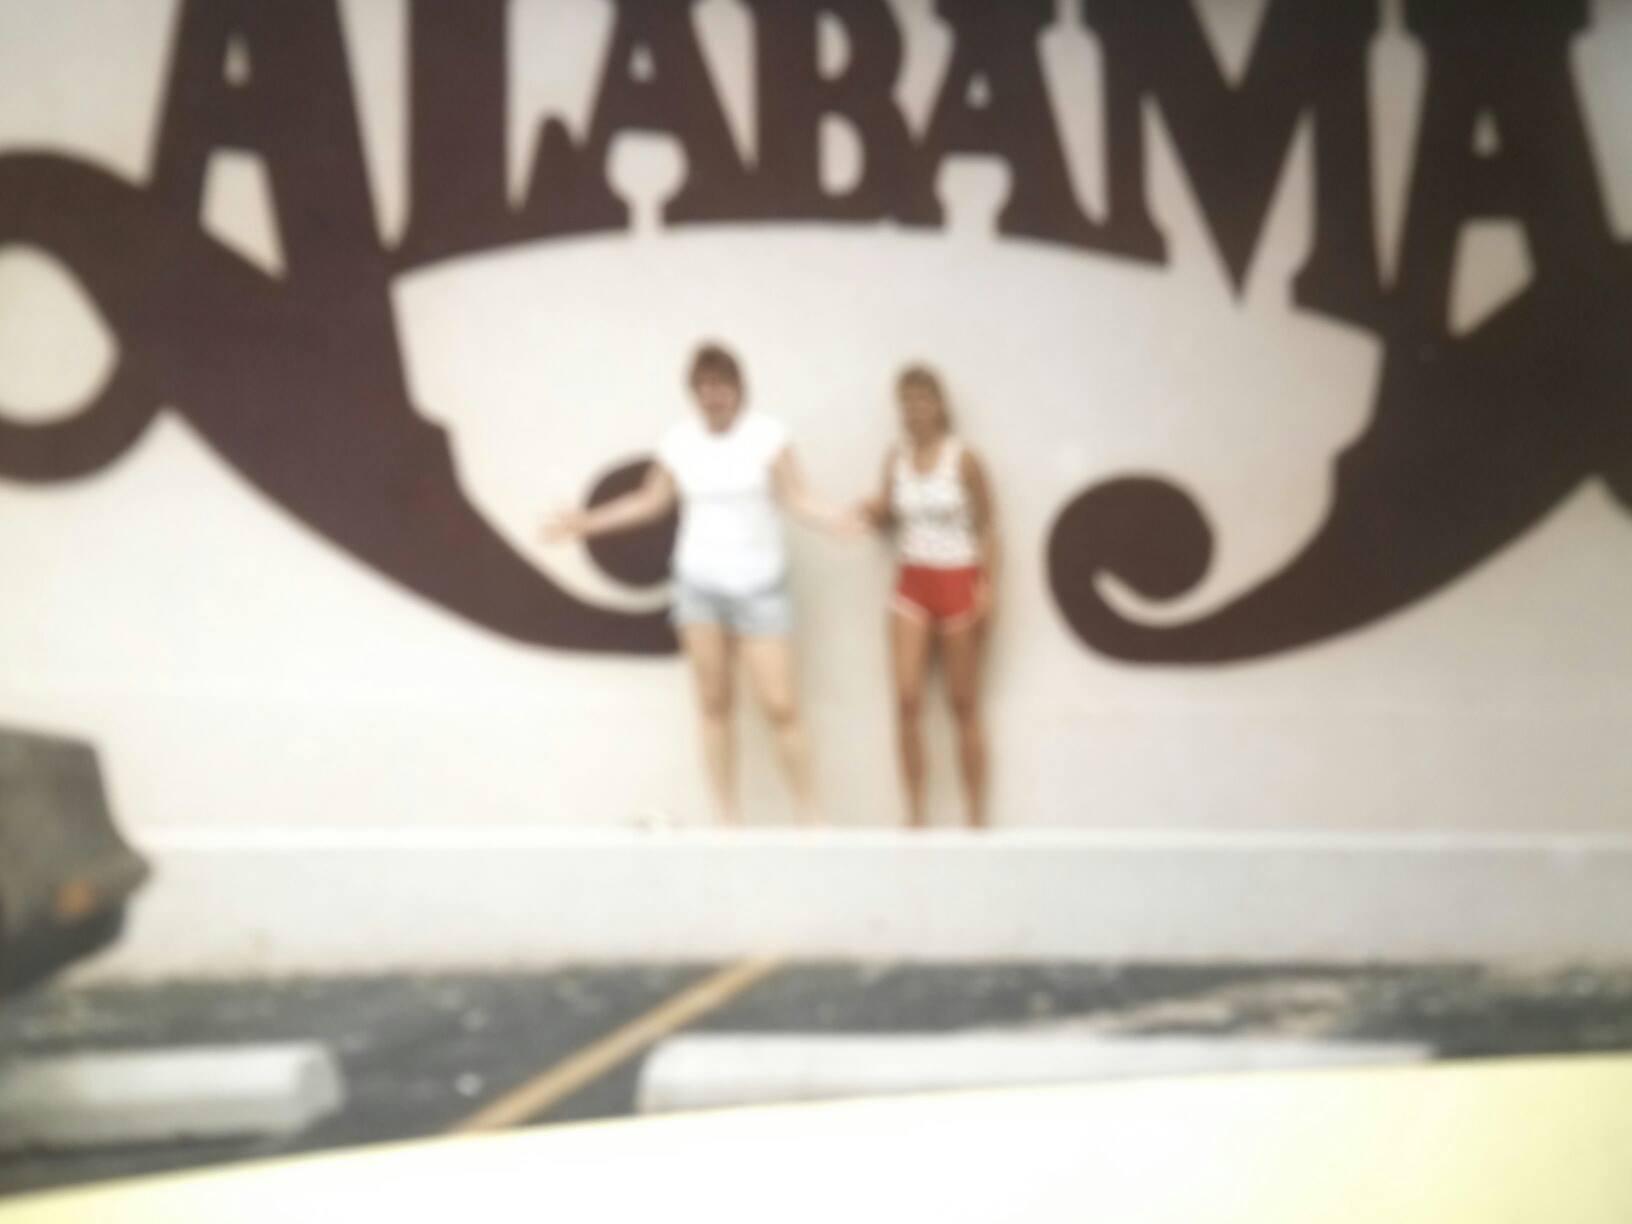 Alabama Pat and Jackie Fan Club